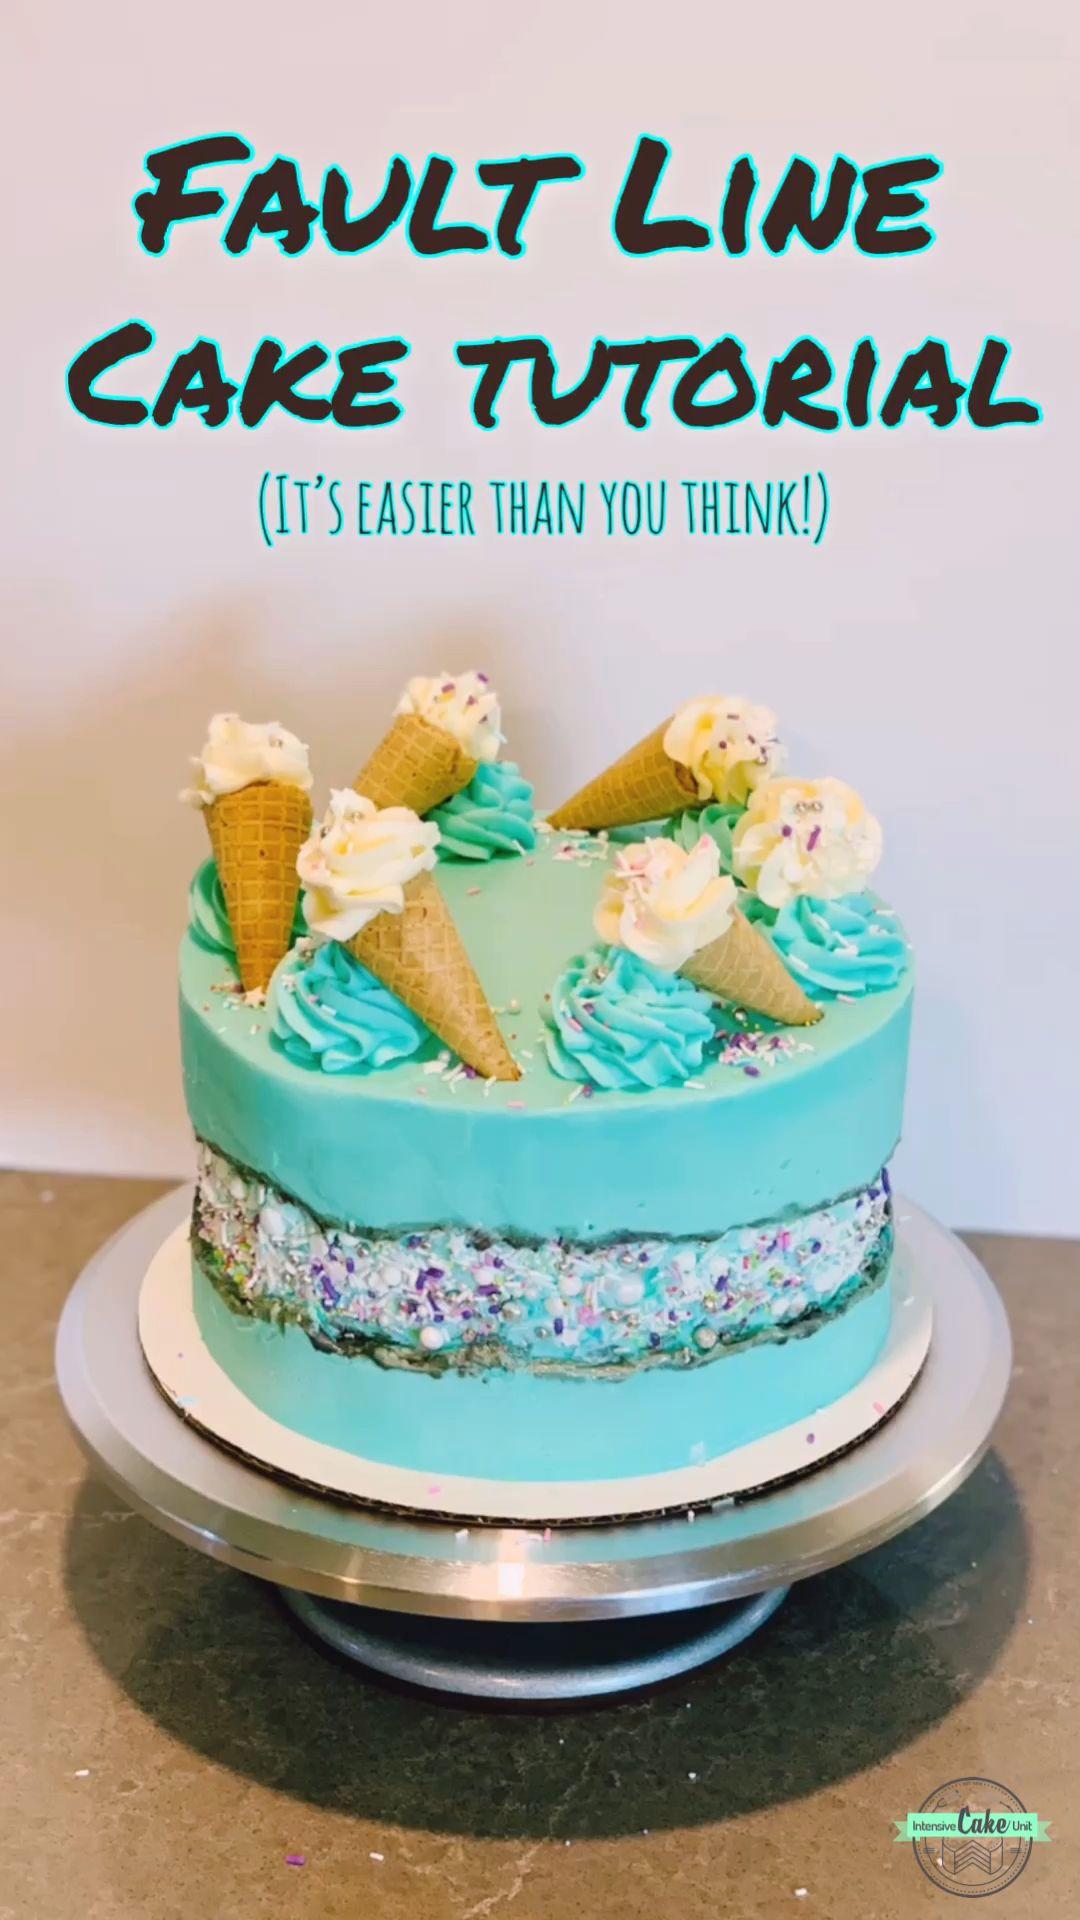 Fault Line Cake Tutorial  #cakedecoratingvideos